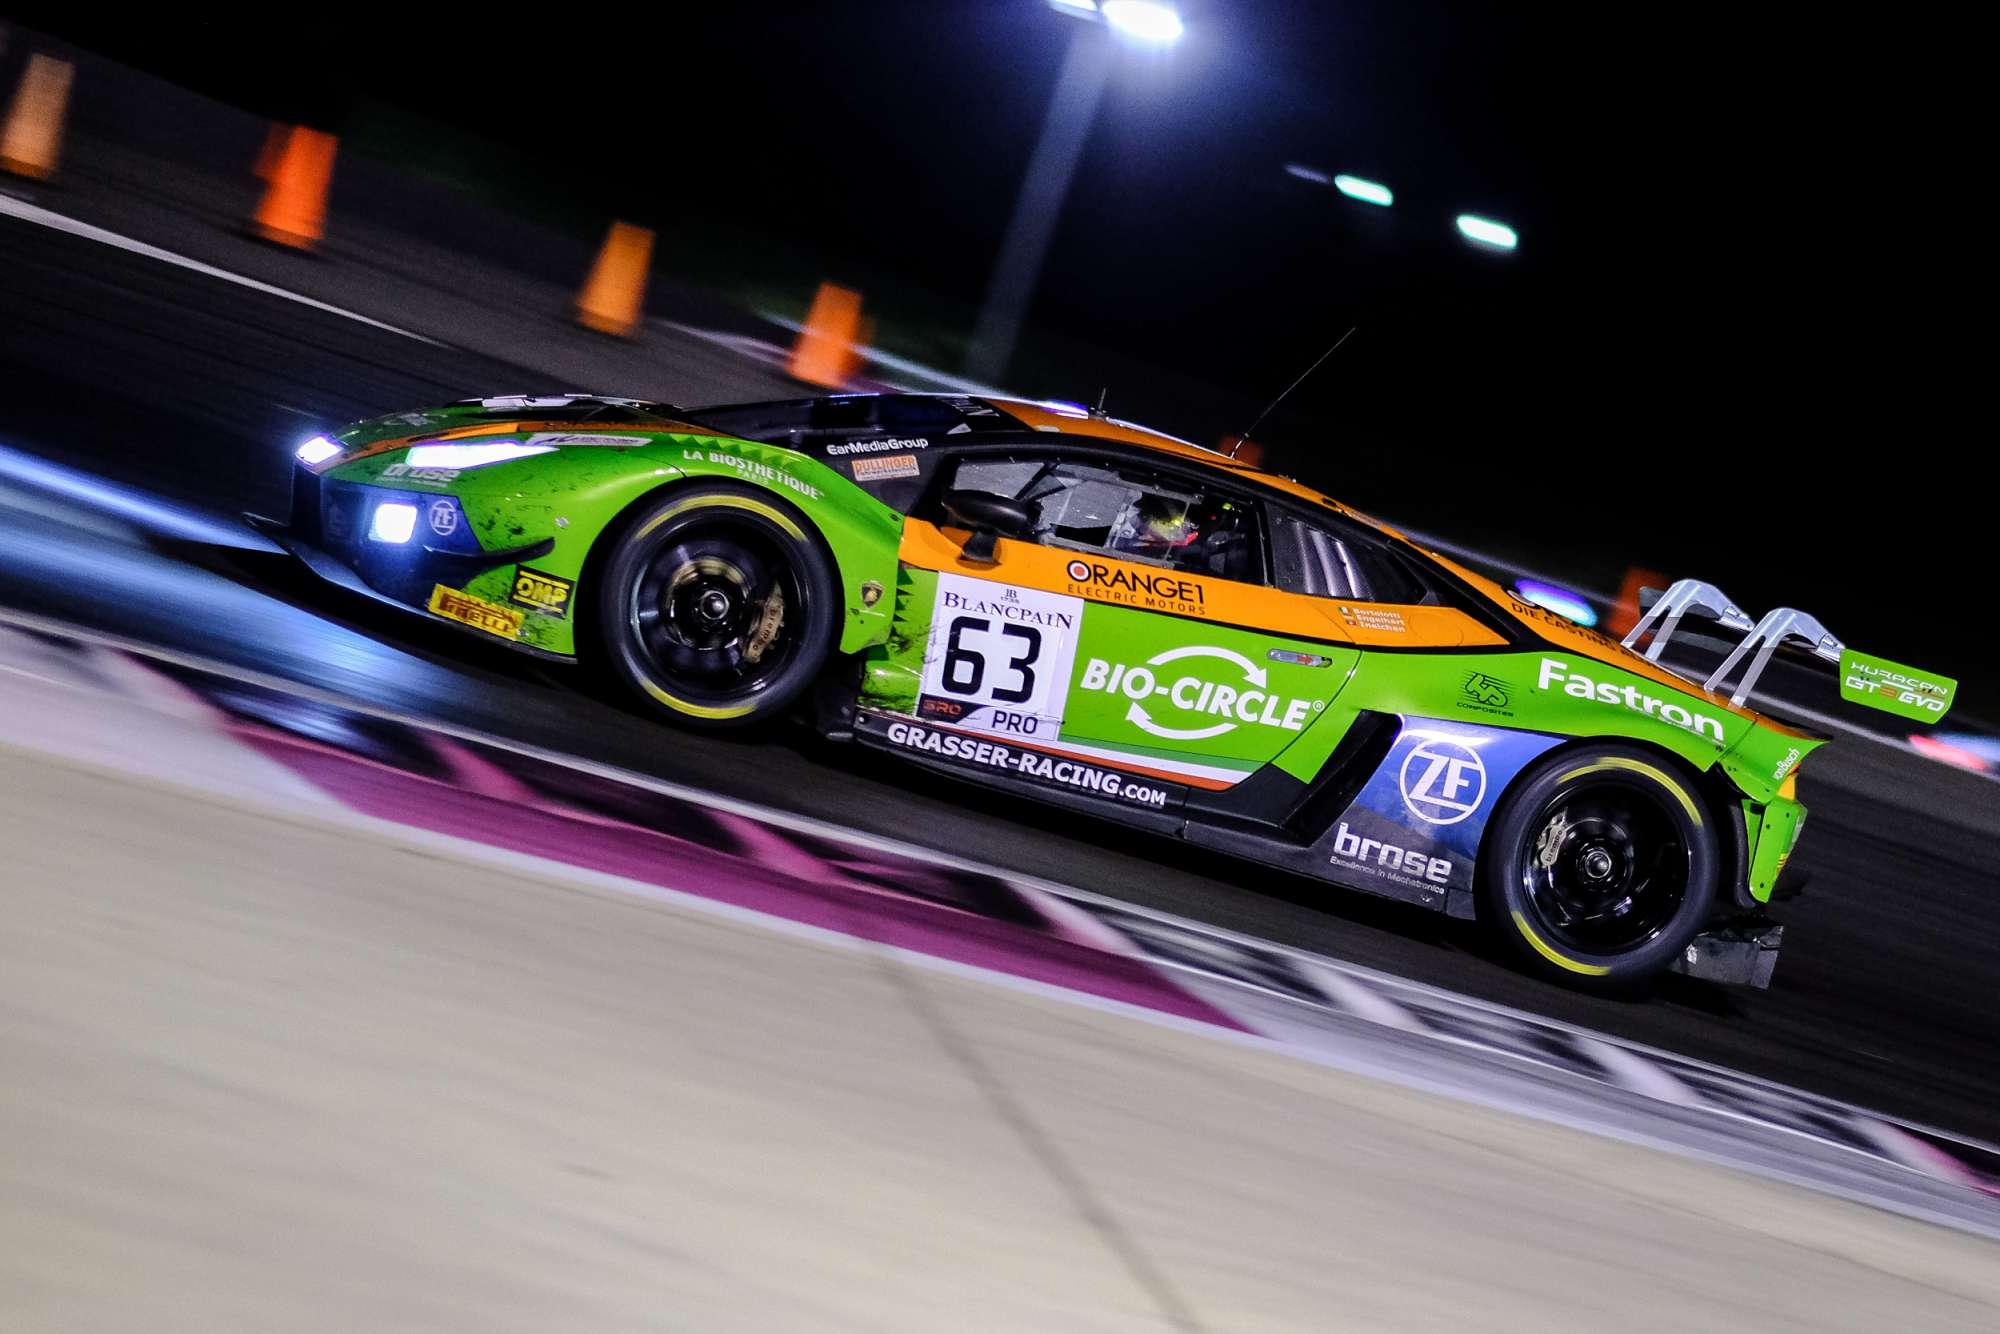 GRT Grasser Racing in Blancpain GT Series Endurance Cup Top 10 at Le Castellet